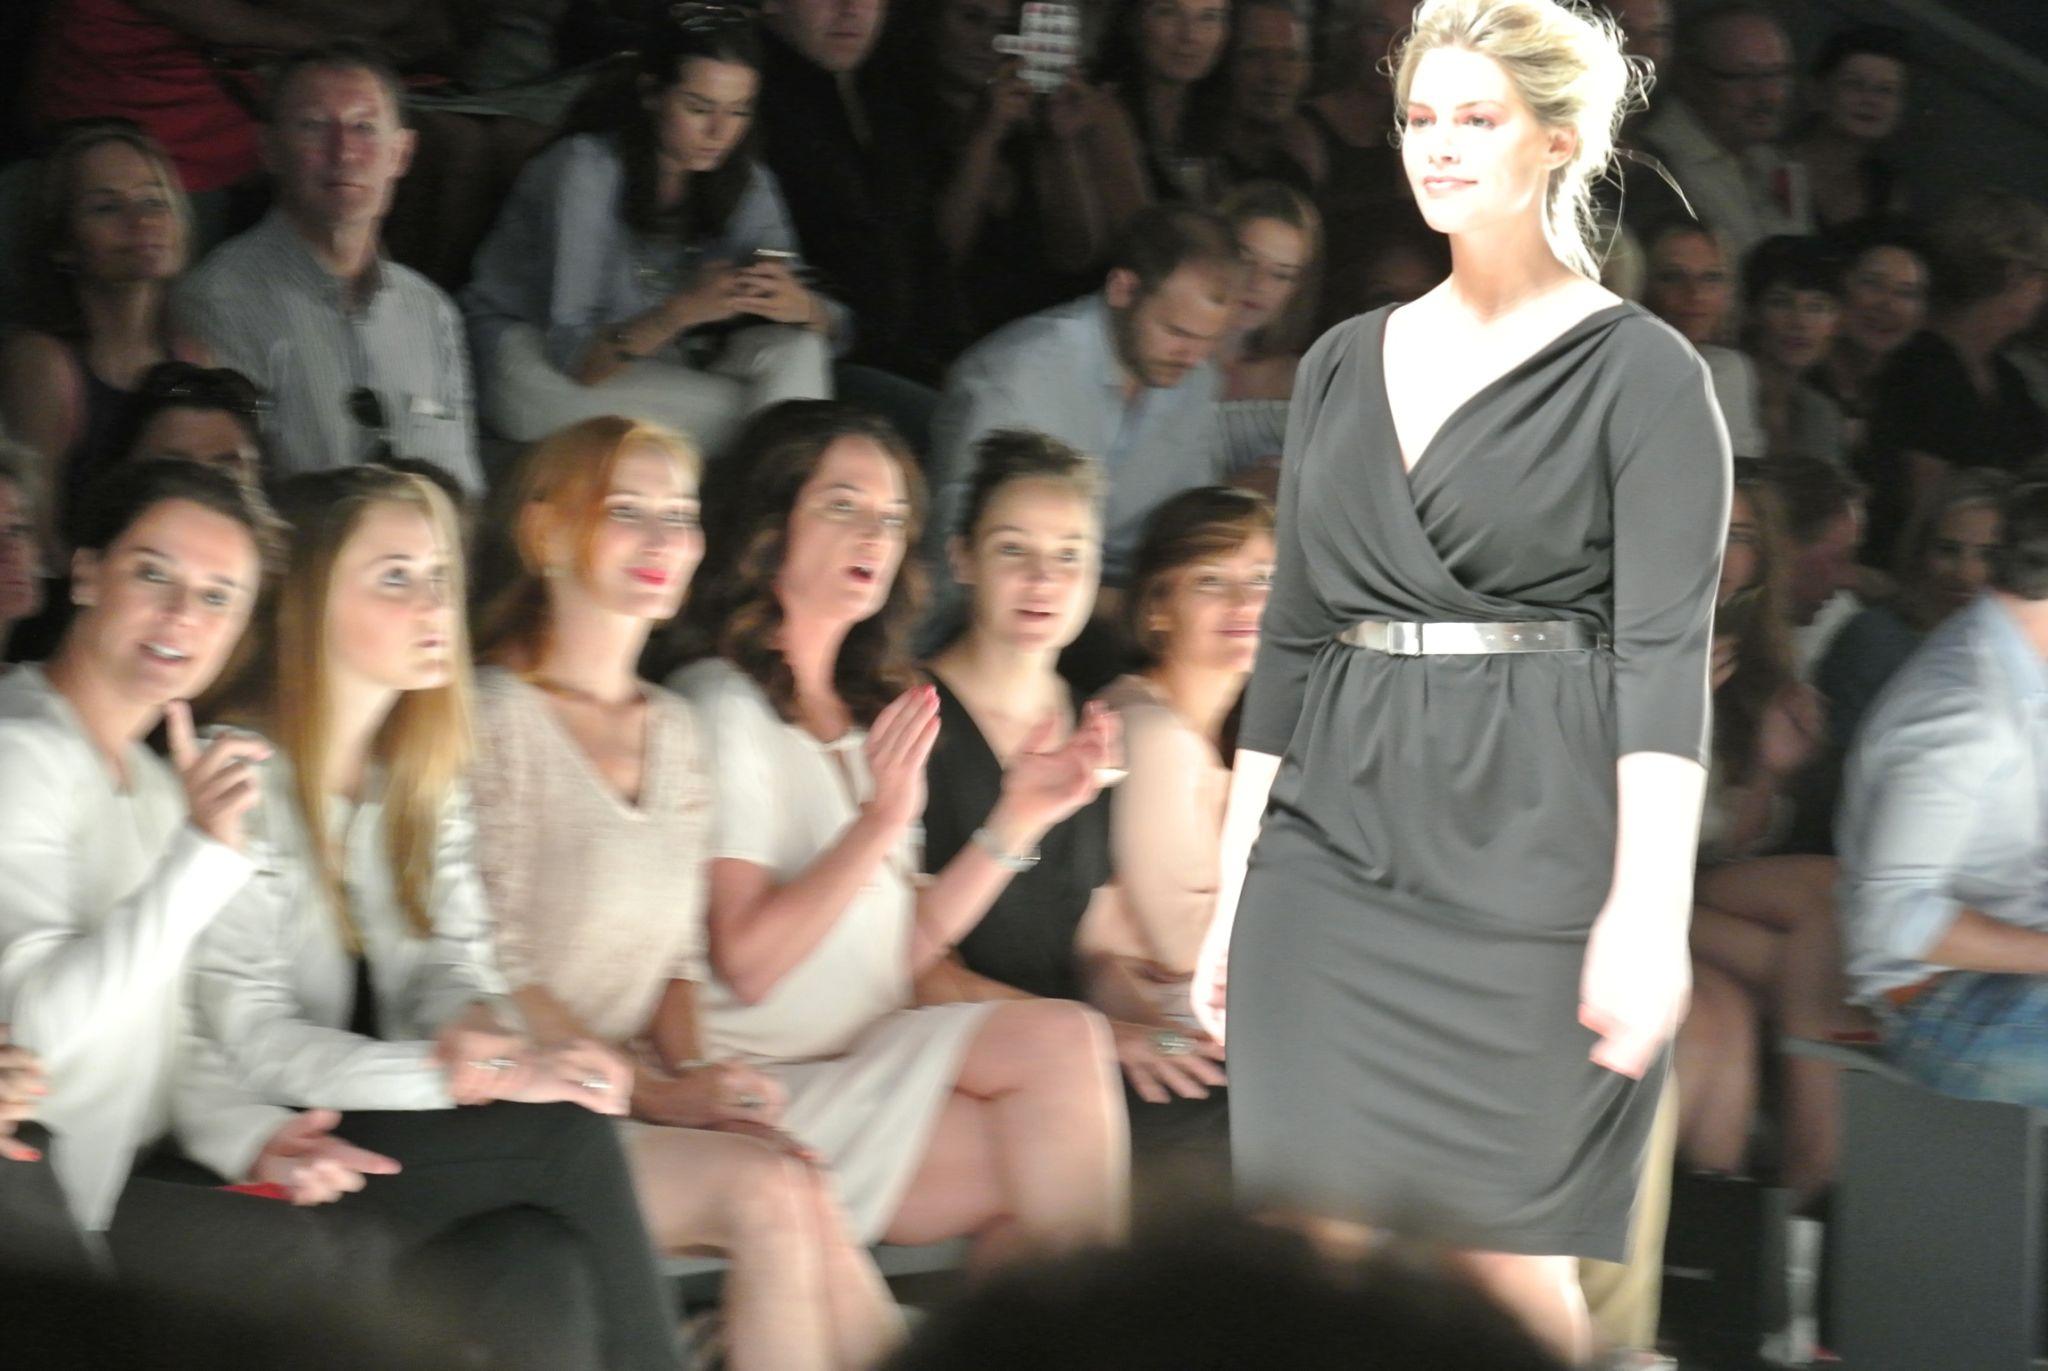 Fashionweek Berlin #mbfw Tag 3 Minx